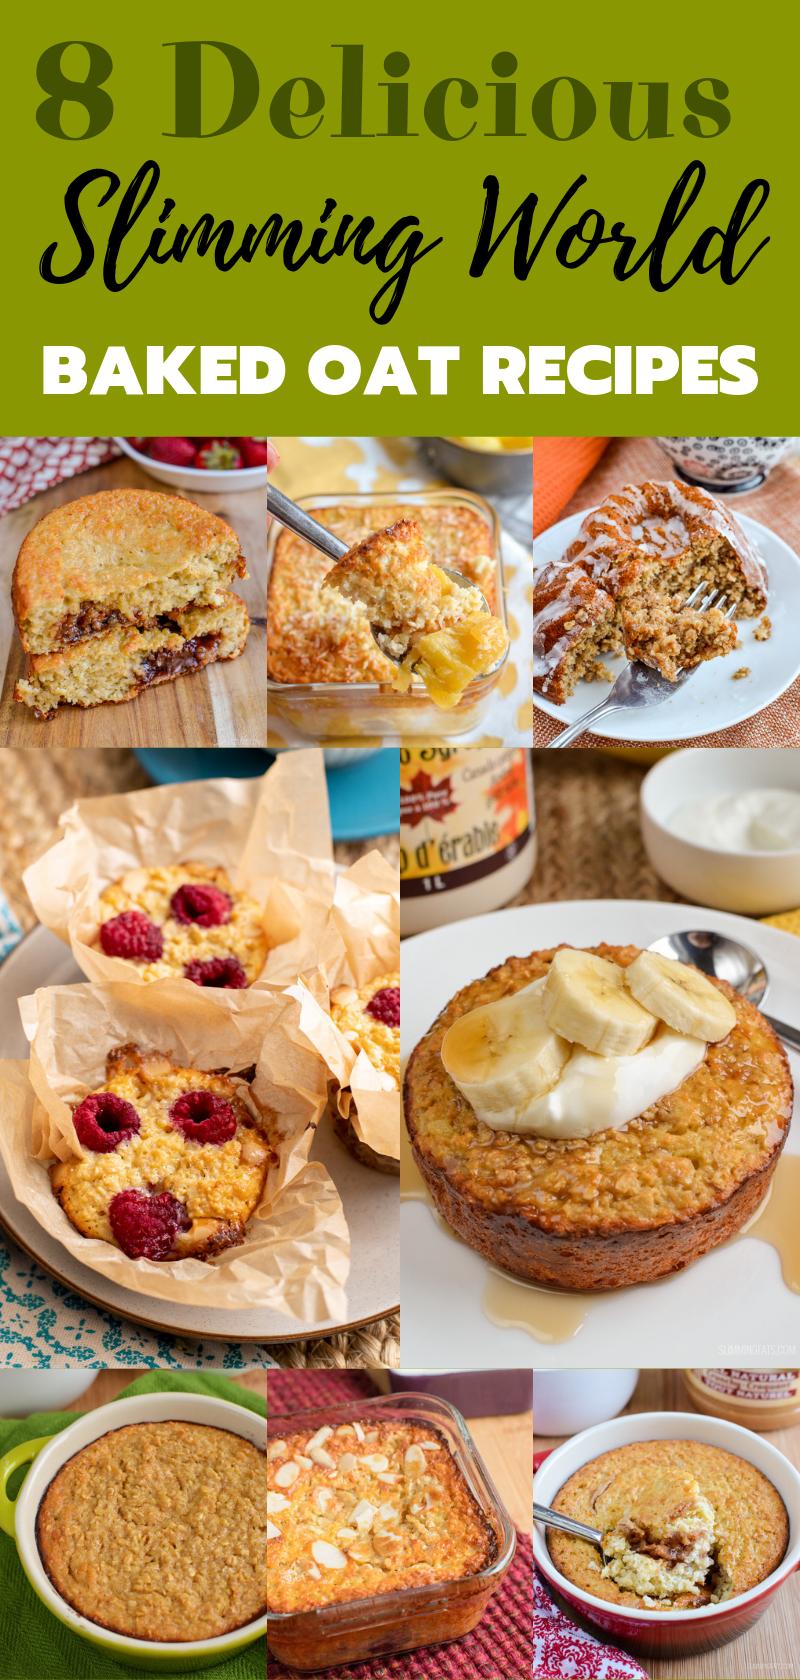 8 baked oat recipes pin image